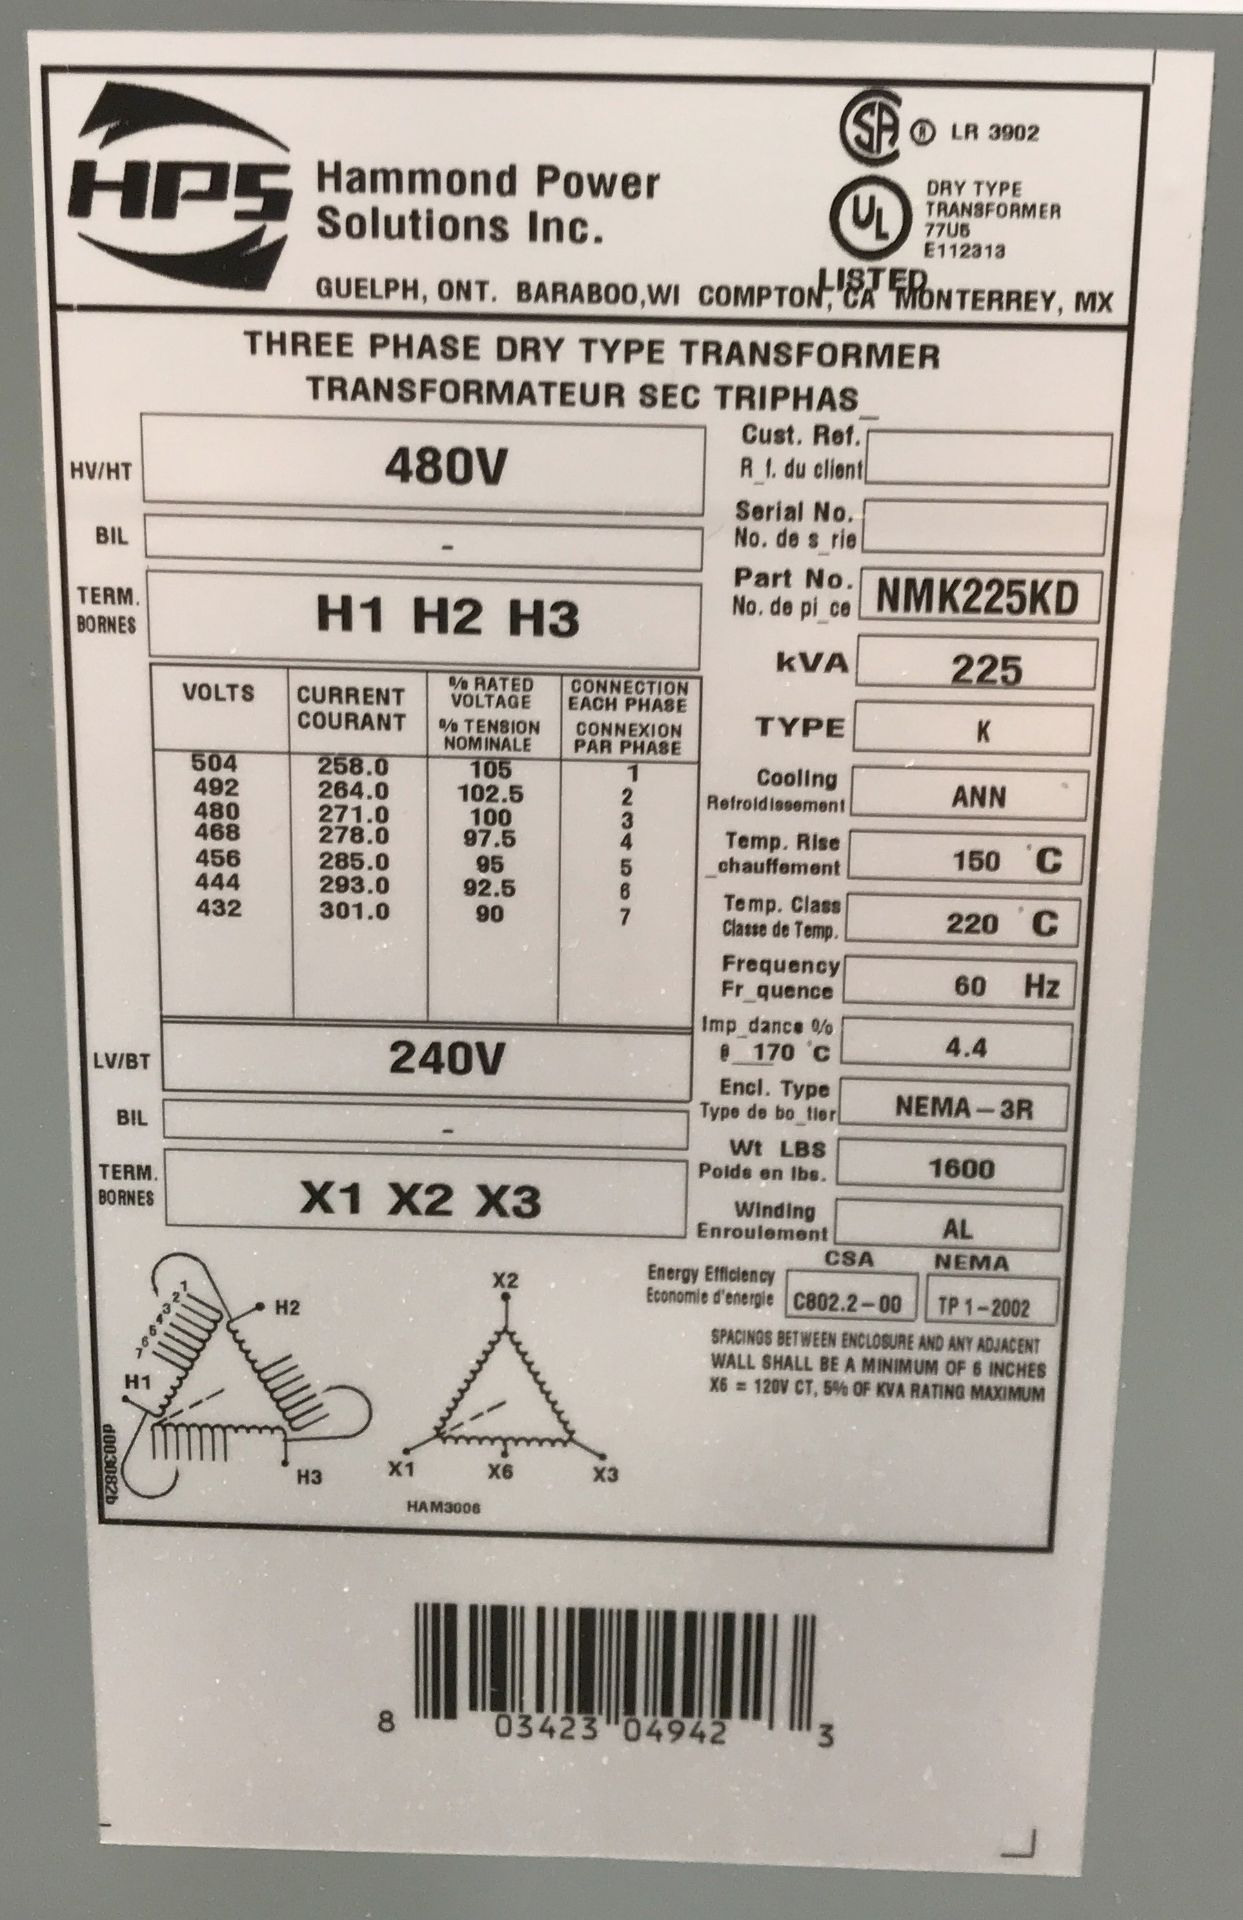 HAMMOND TRANSFORMER 225 KVA, 480V/240V, 3 PHASE [RIGGING FEES FOR LOT# 34 - $50 USD PLUS - Image 2 of 2